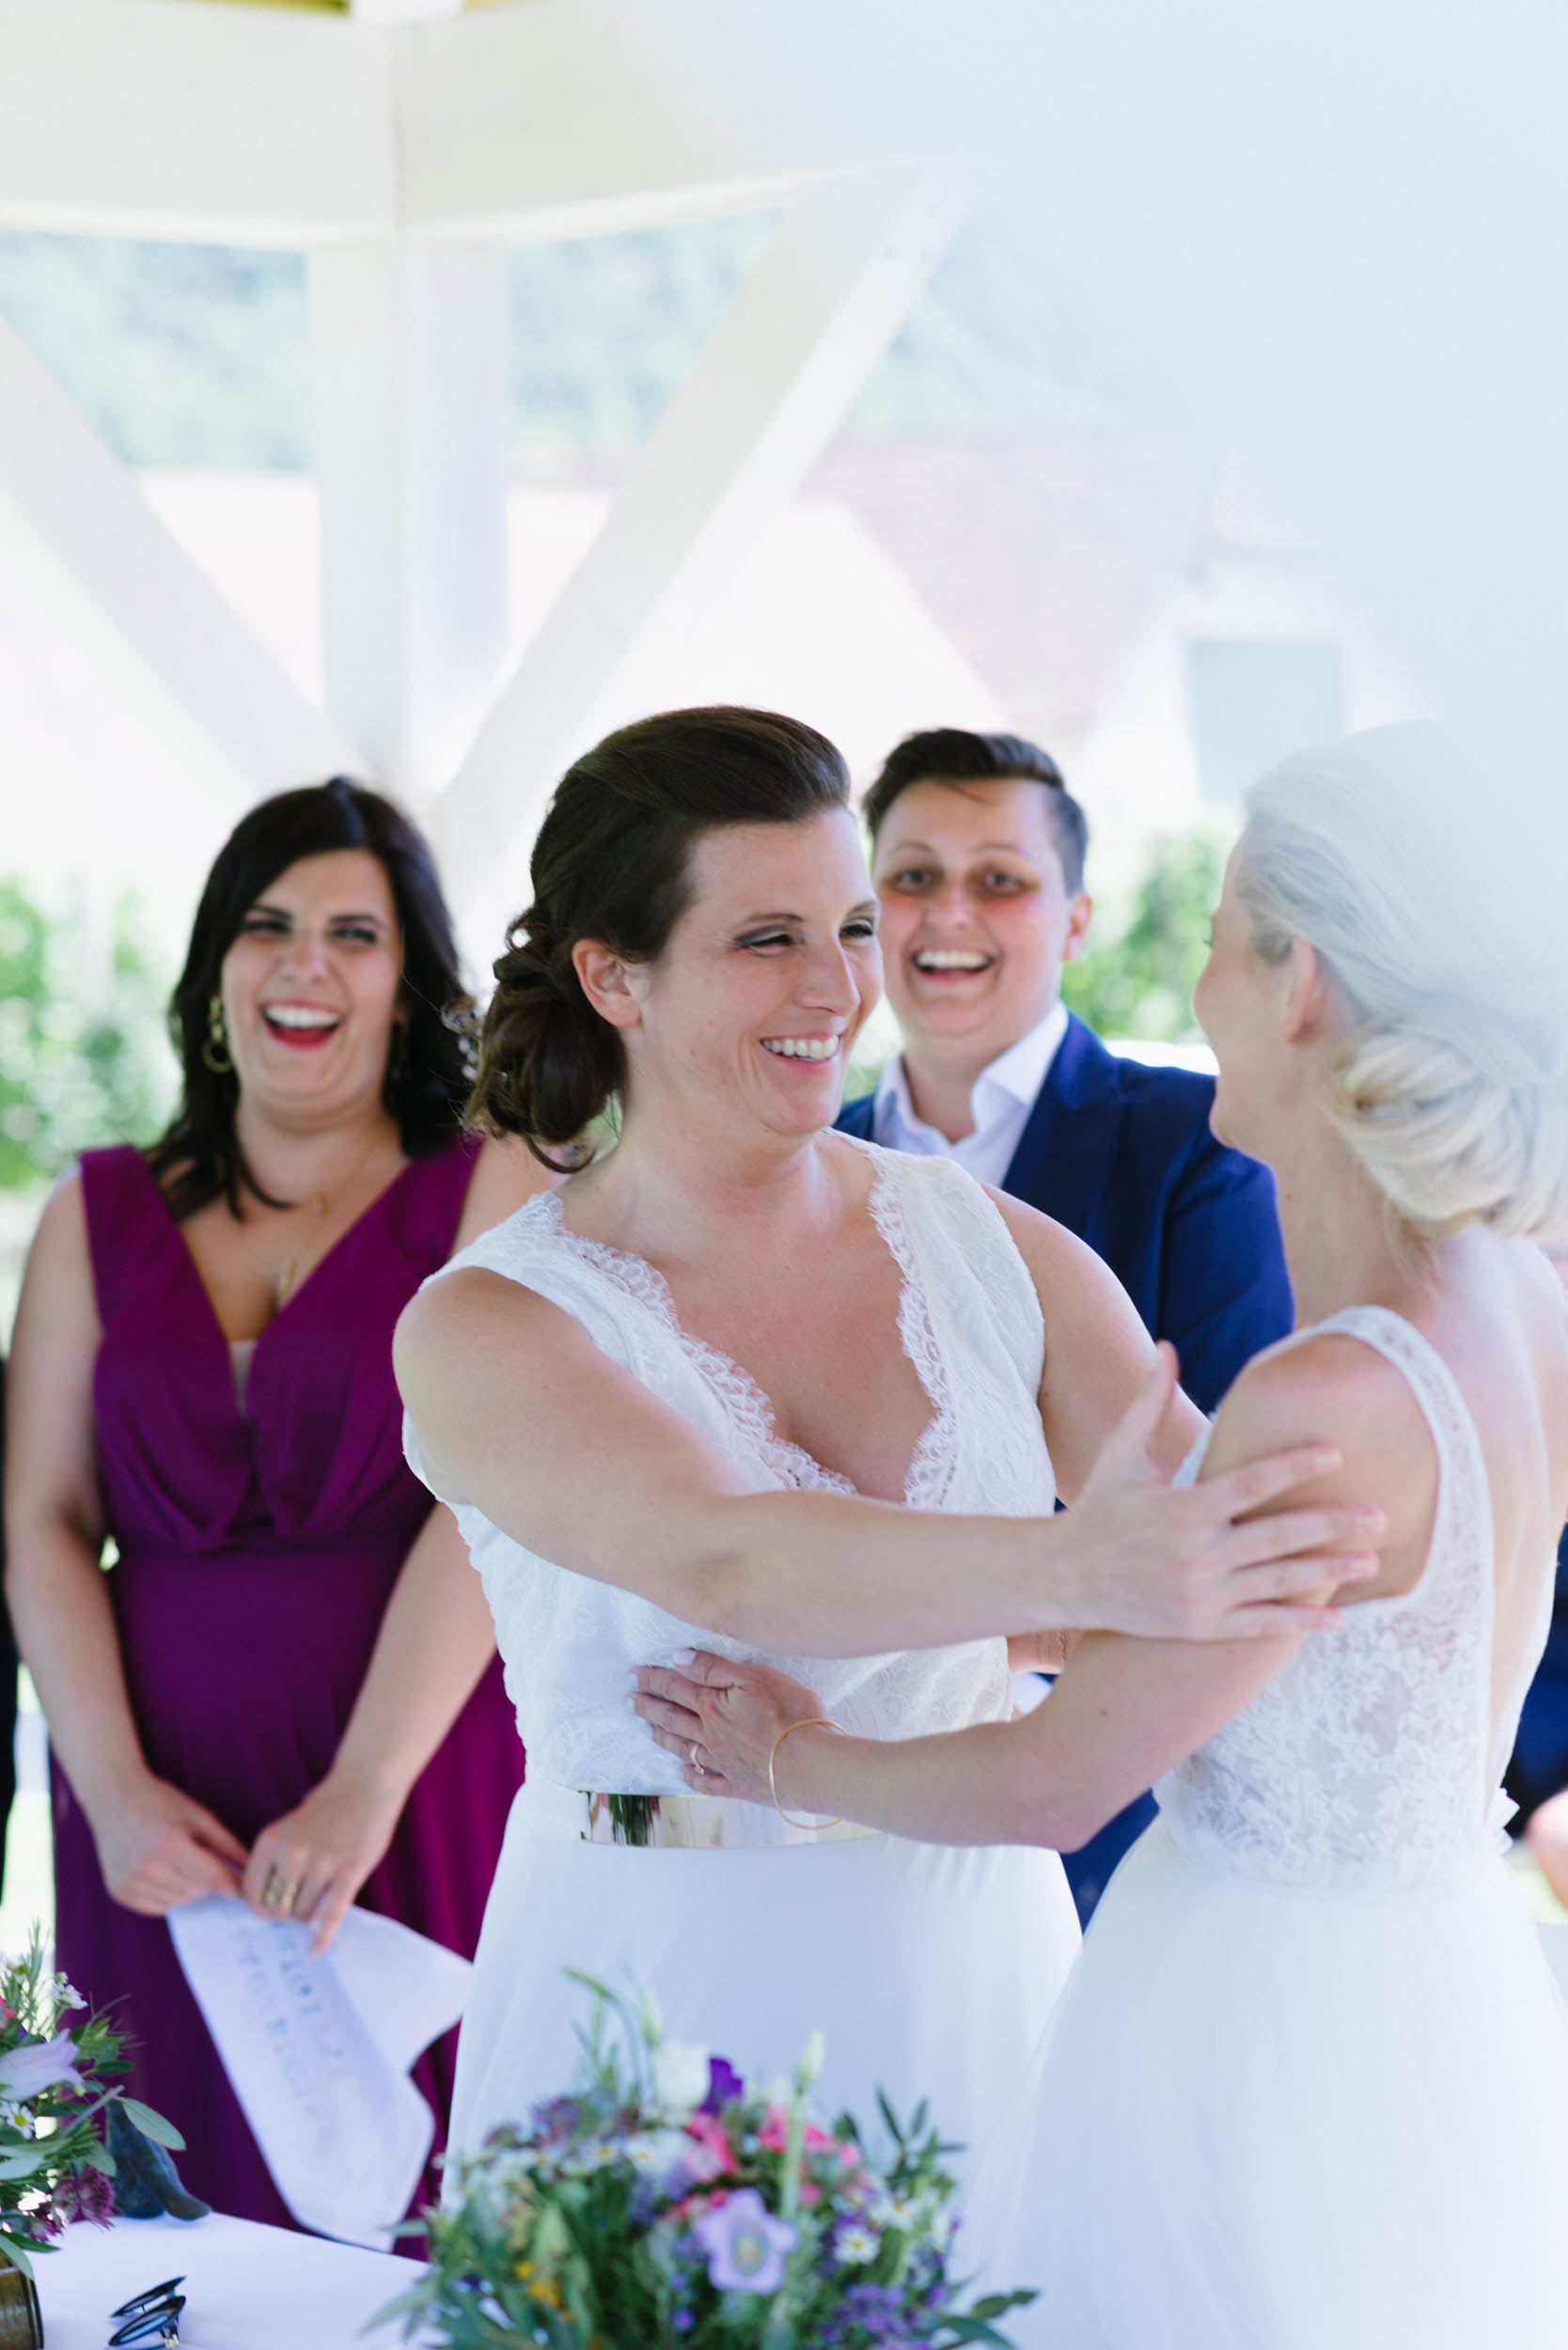 belle&sass__Lesbian Wedding in Austria_0053.jpg